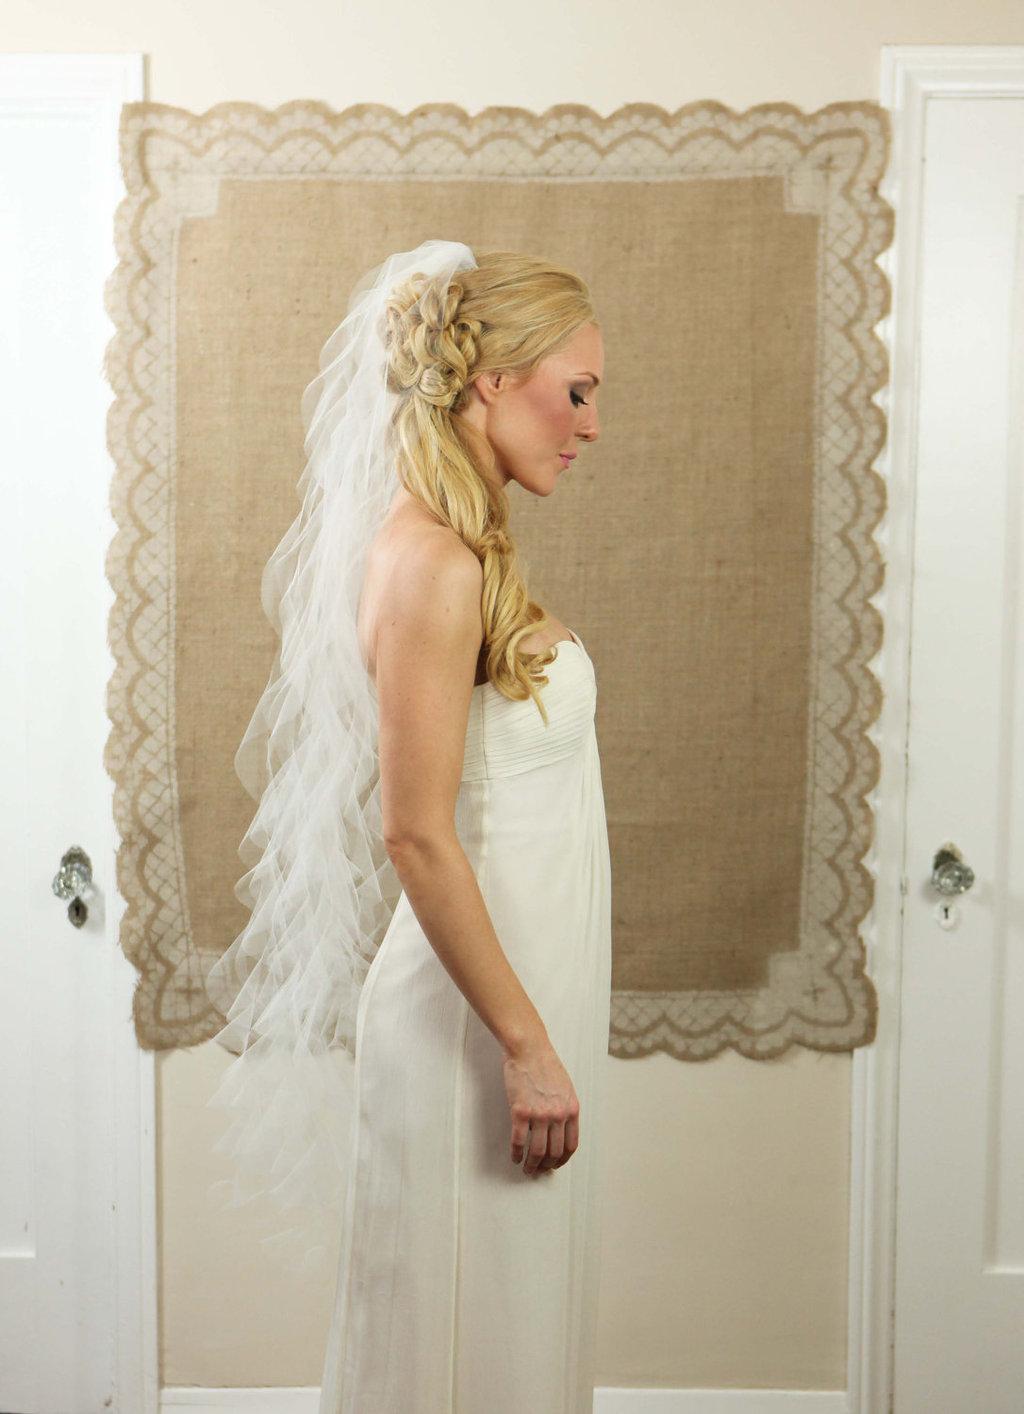 Wedding-hair-accessories-for-romantic-brides-mantilla-veil-1.full